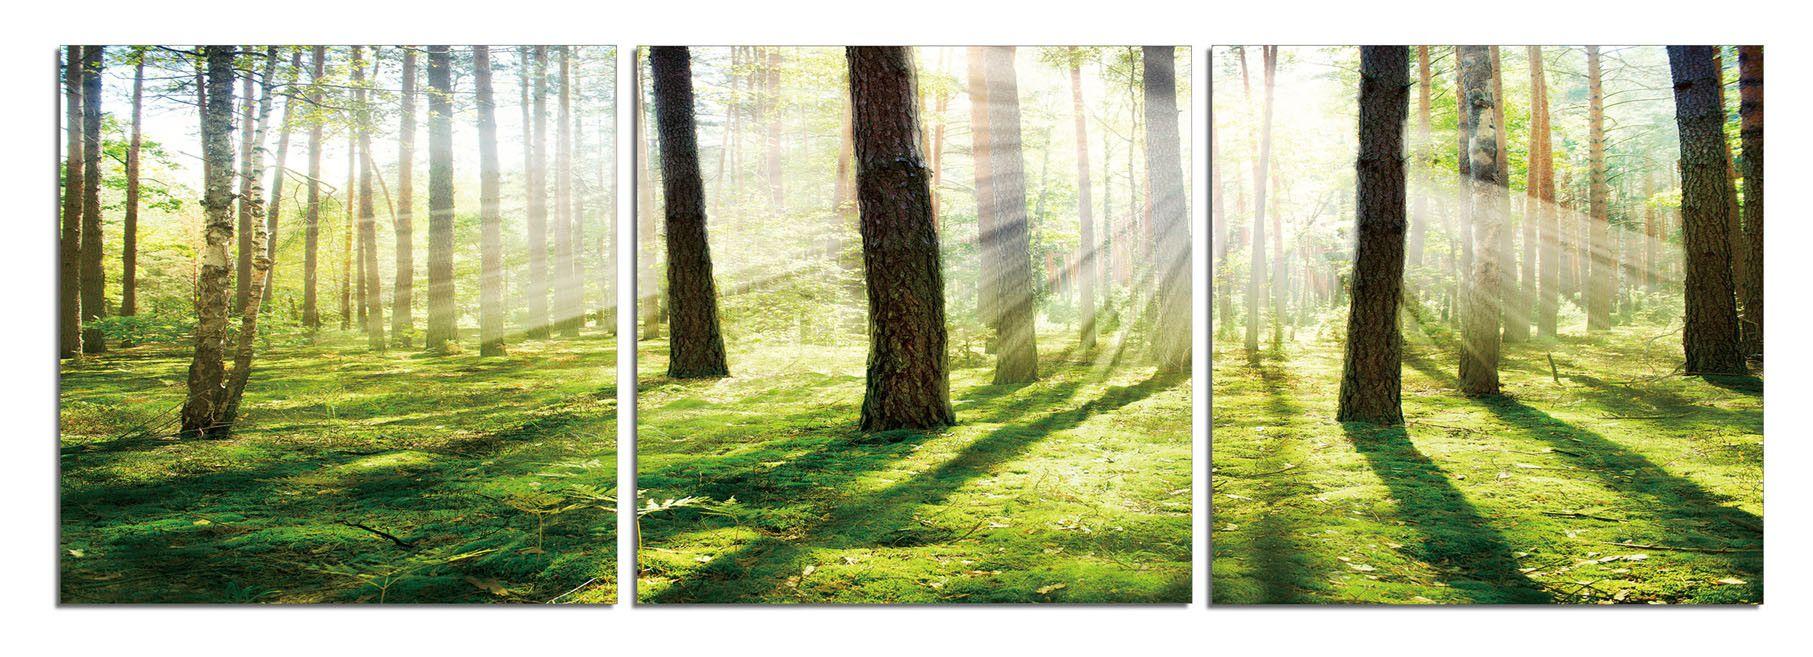 Sunrise Reflection | Trees, Its cold and Landscapes - Sunrise Reflection